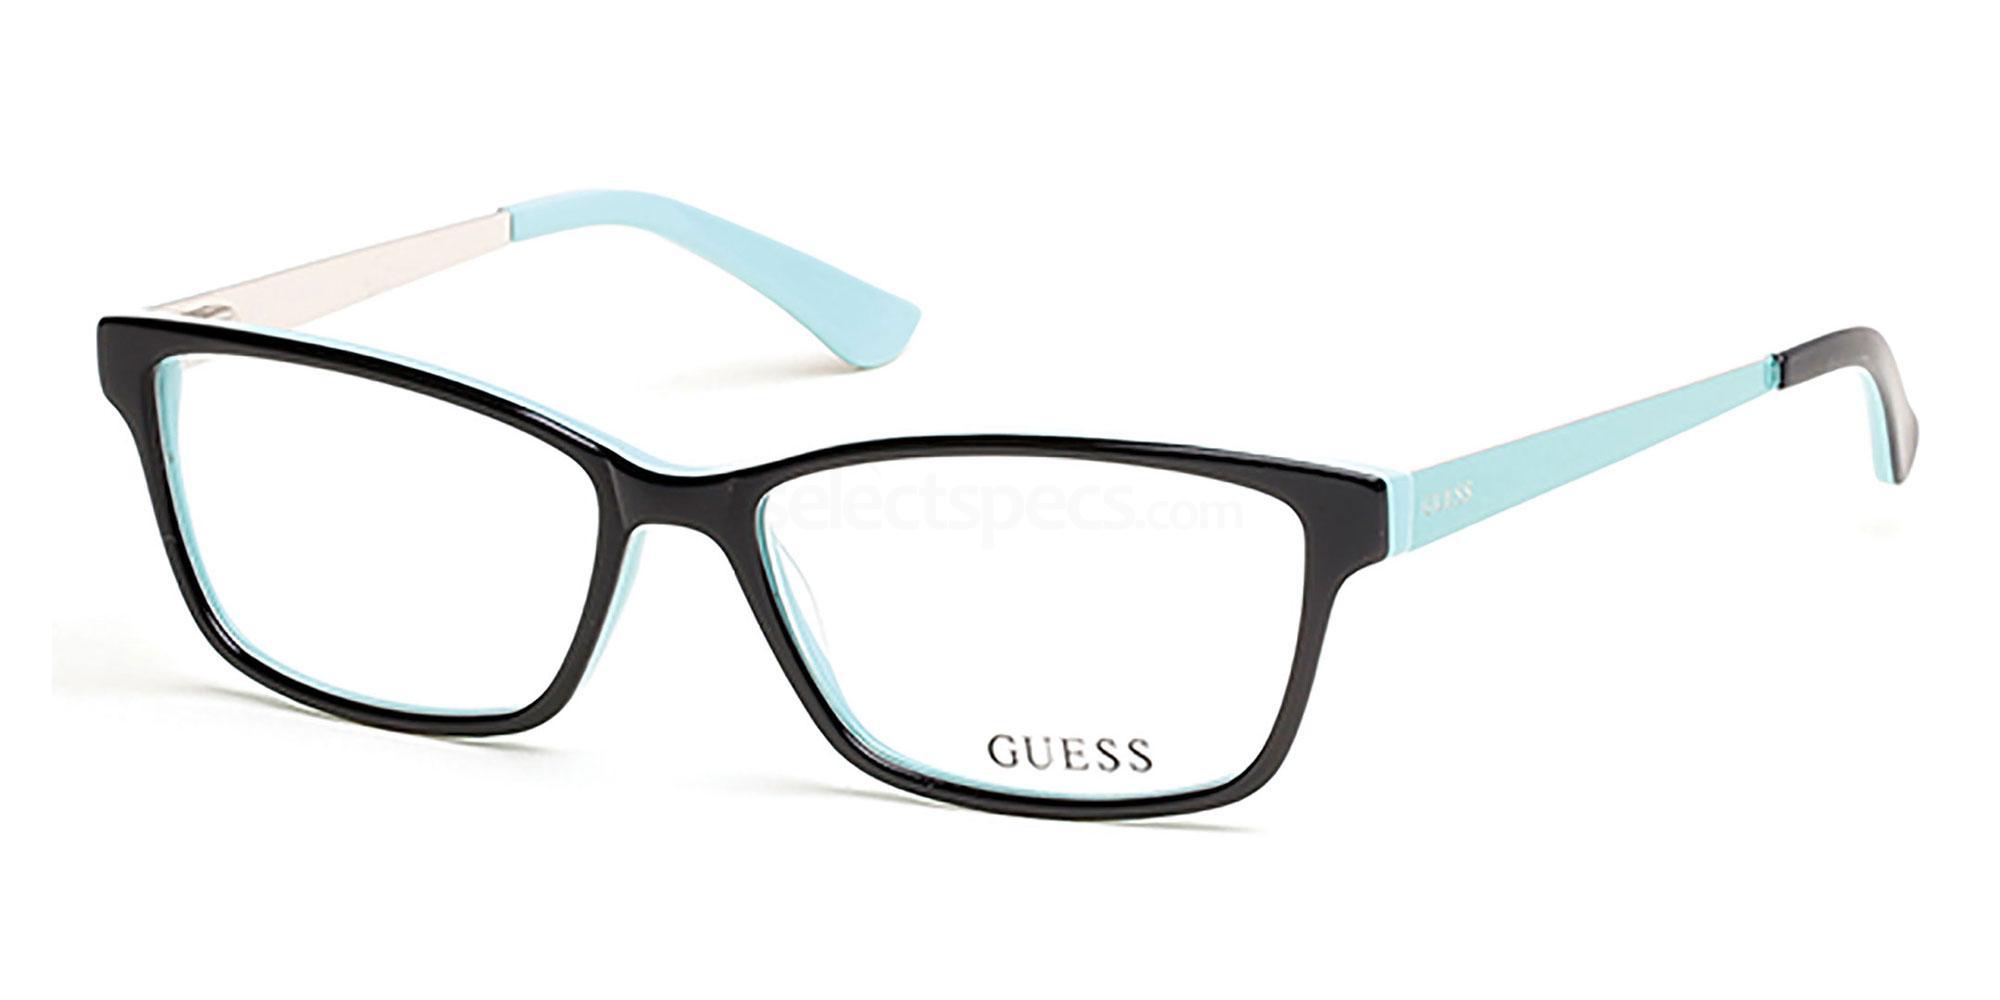 005 GU2538 Glasses, Guess